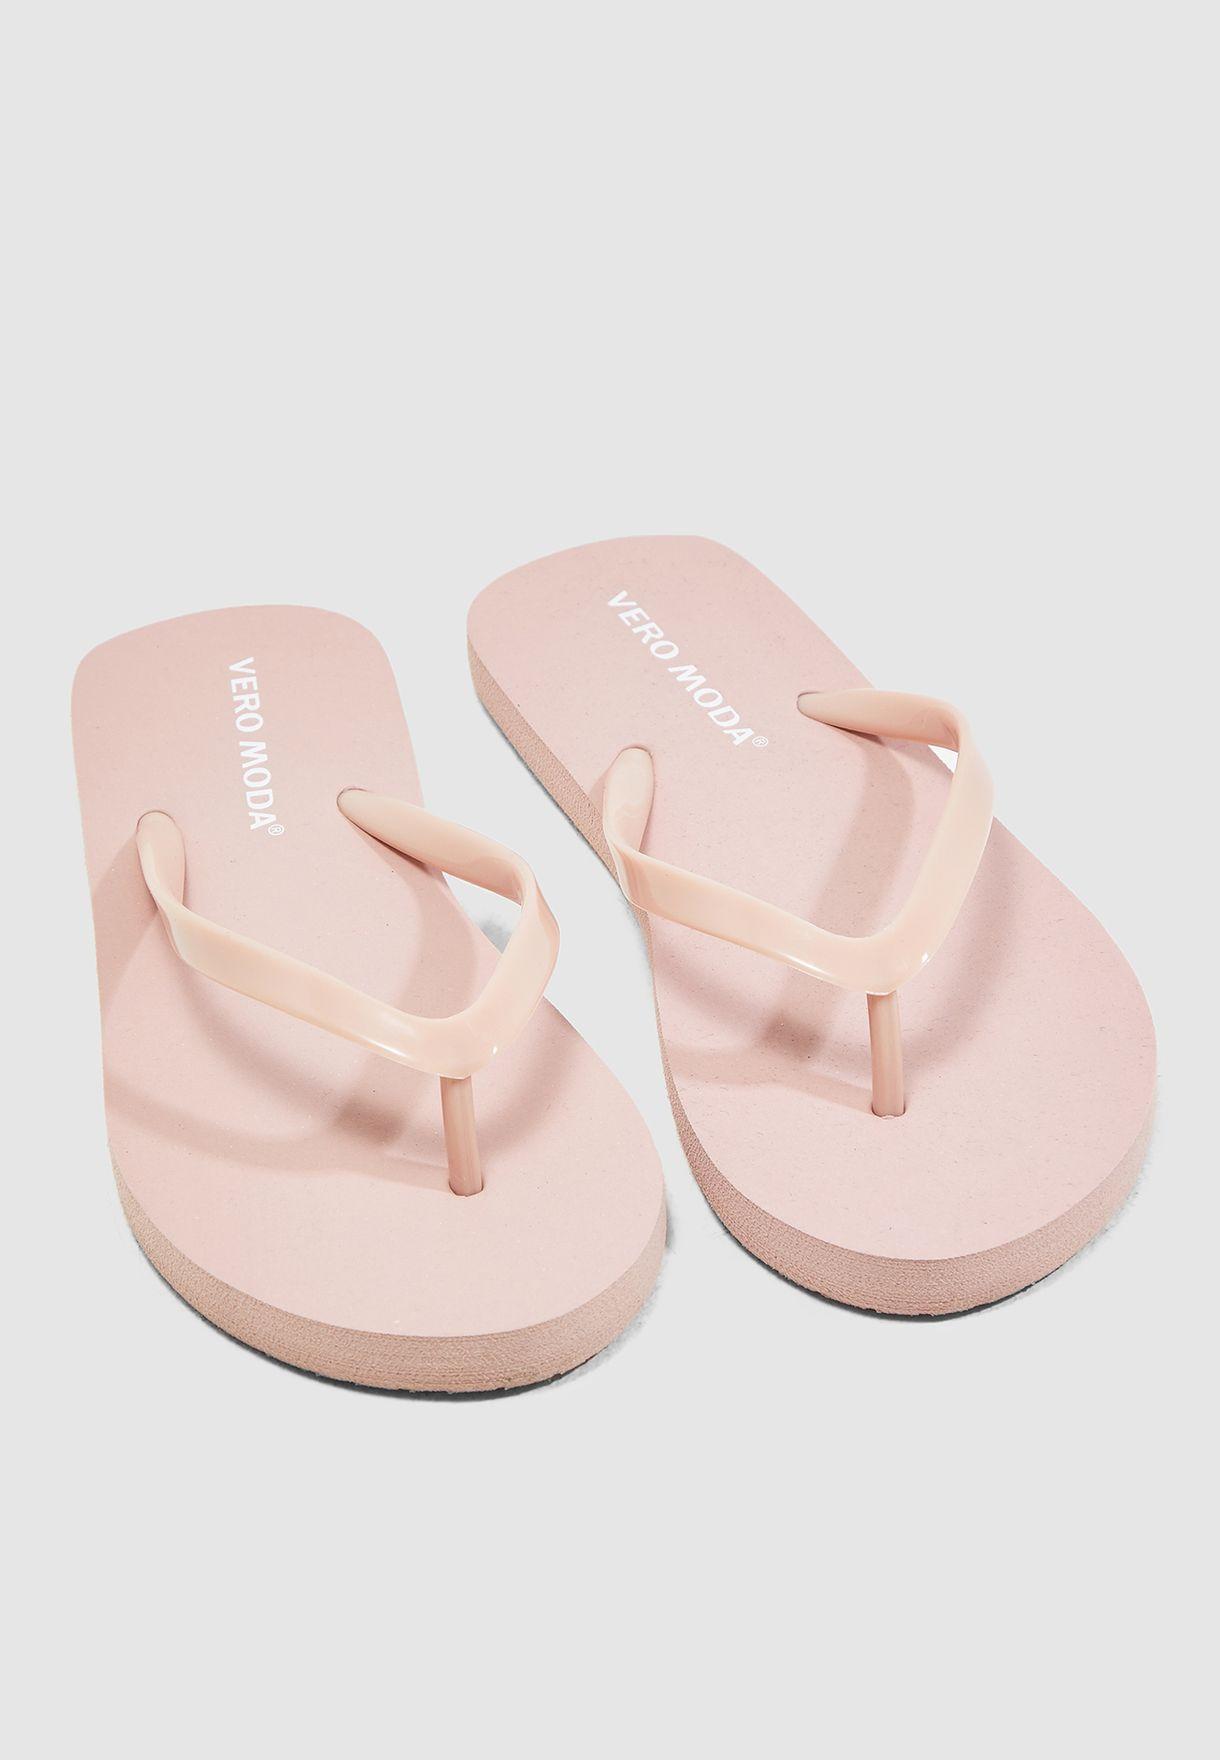 e2c4e26355af5 Shop Vero Moda pink Ida Flip Flop 10214144 for Women in Saudi ...